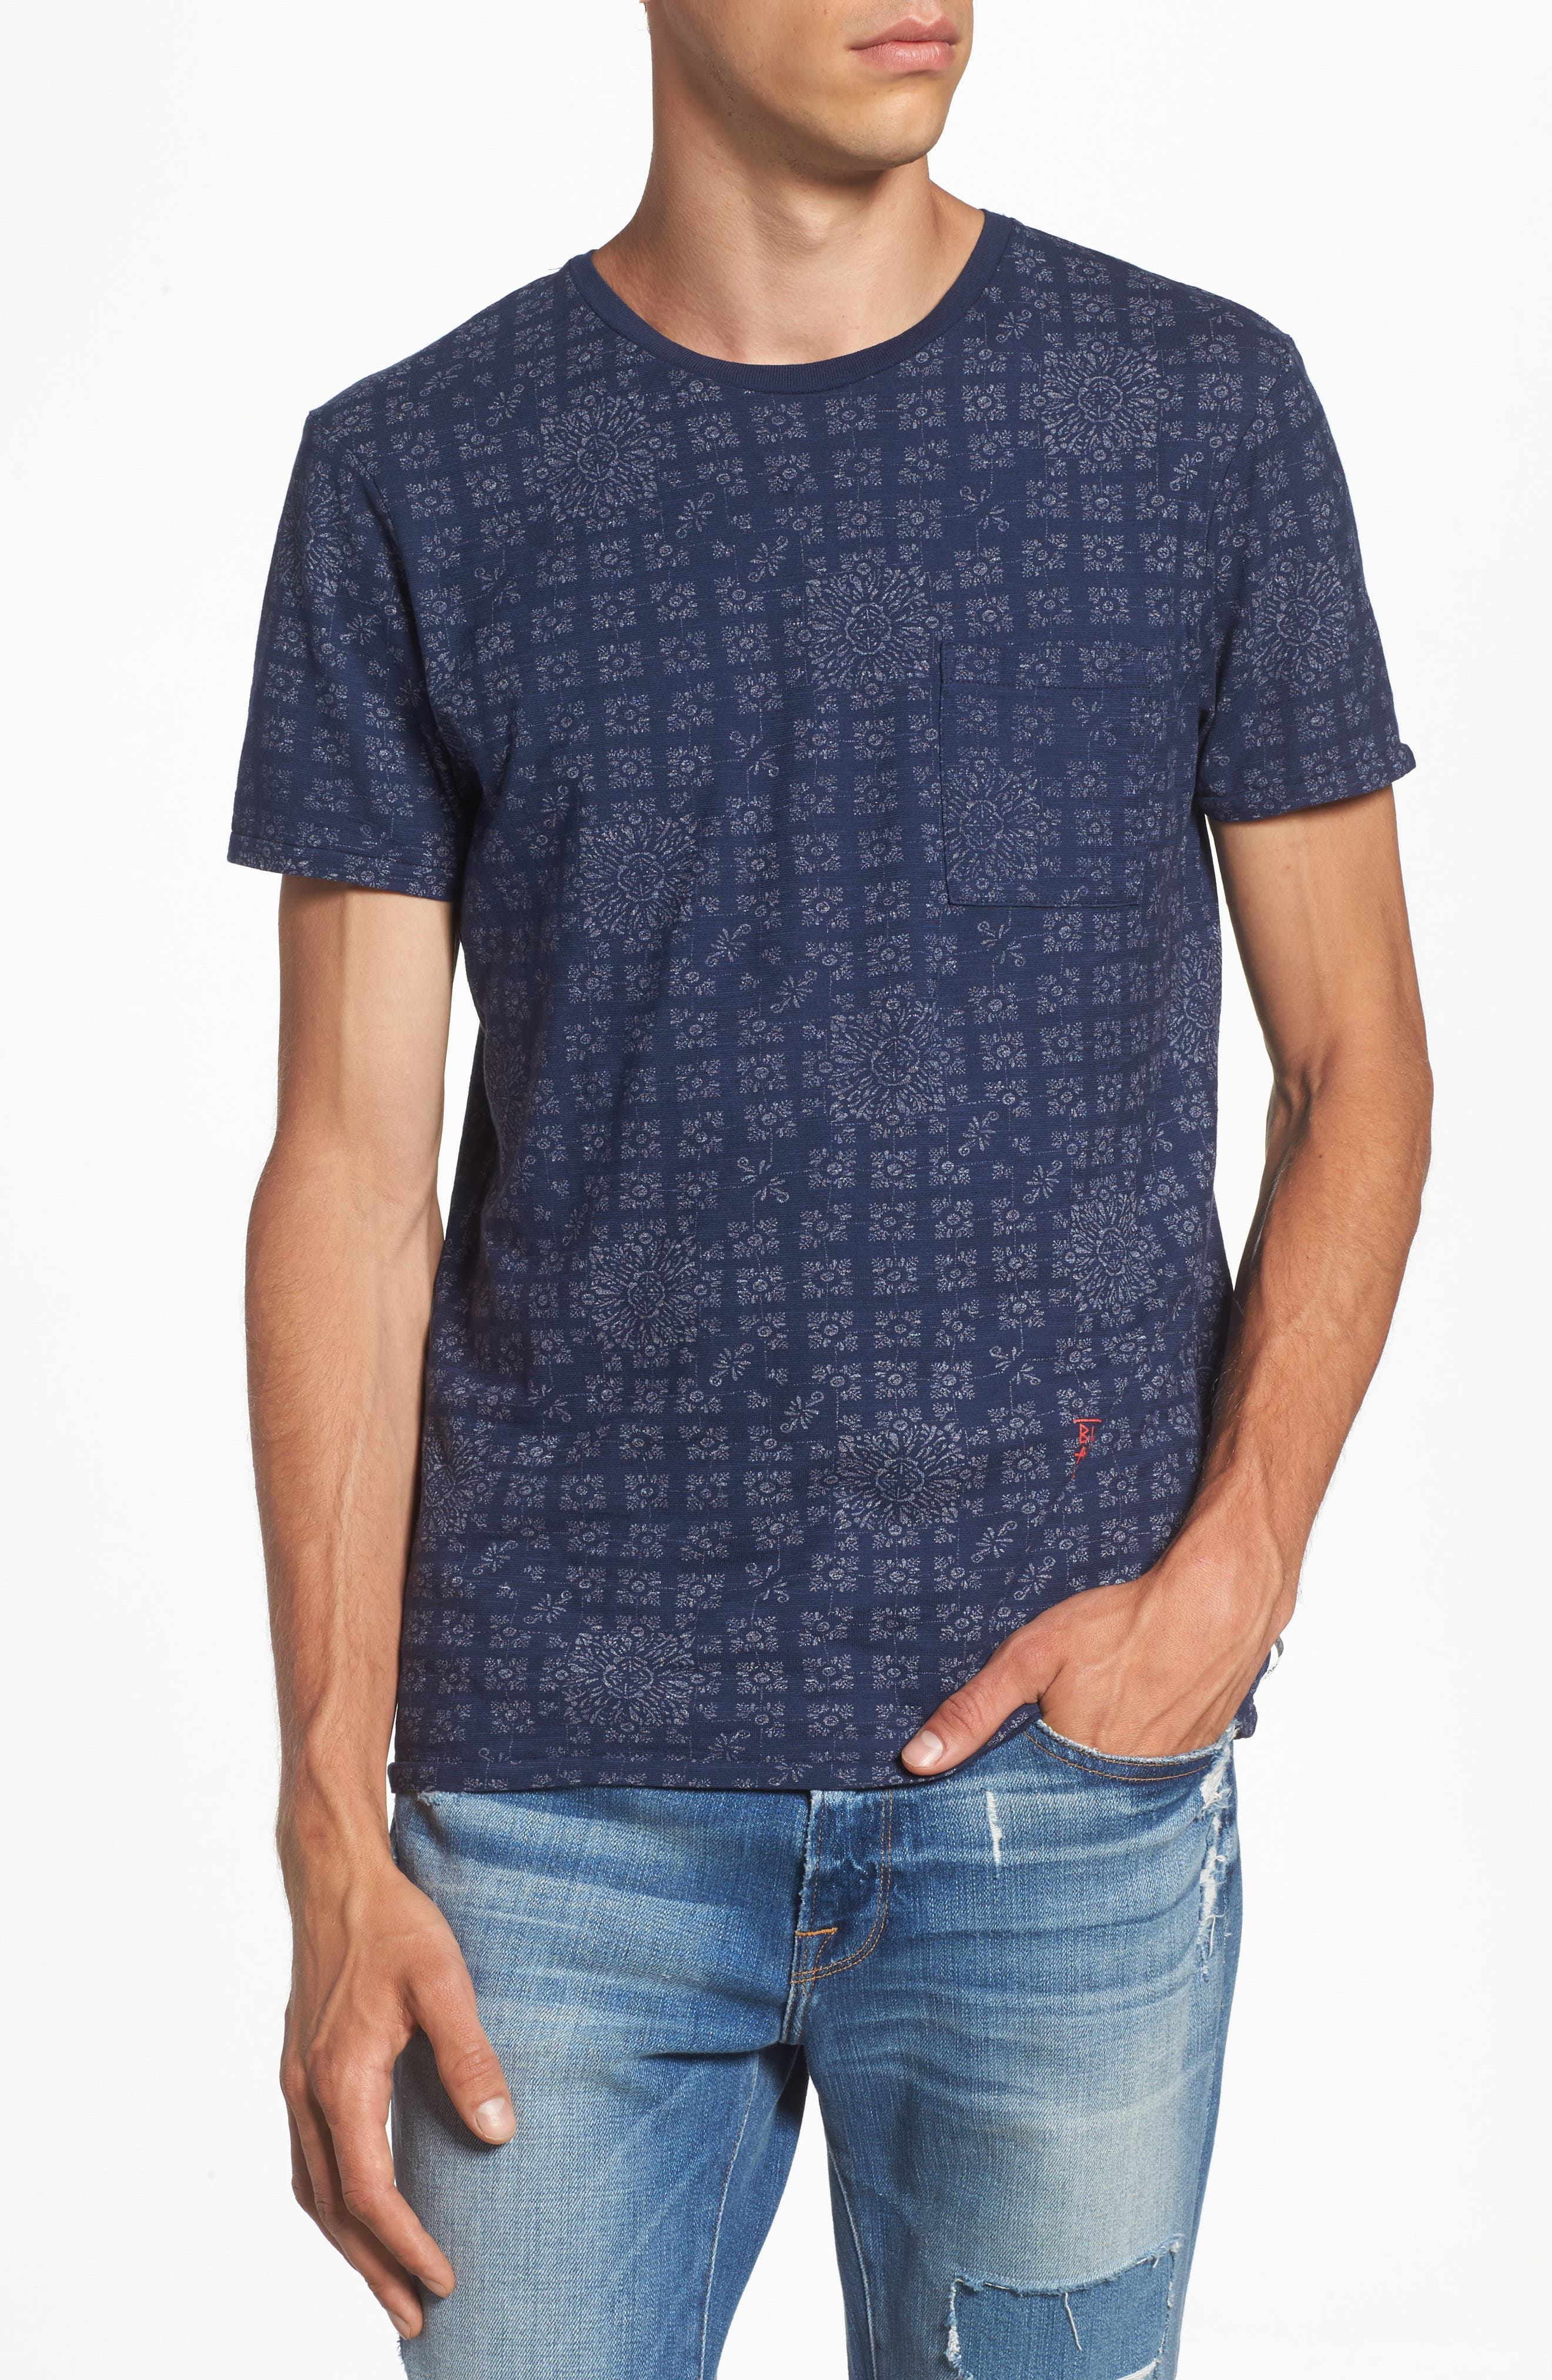 Main Image - Scotch & Soda AMS Graphic T-Shirt